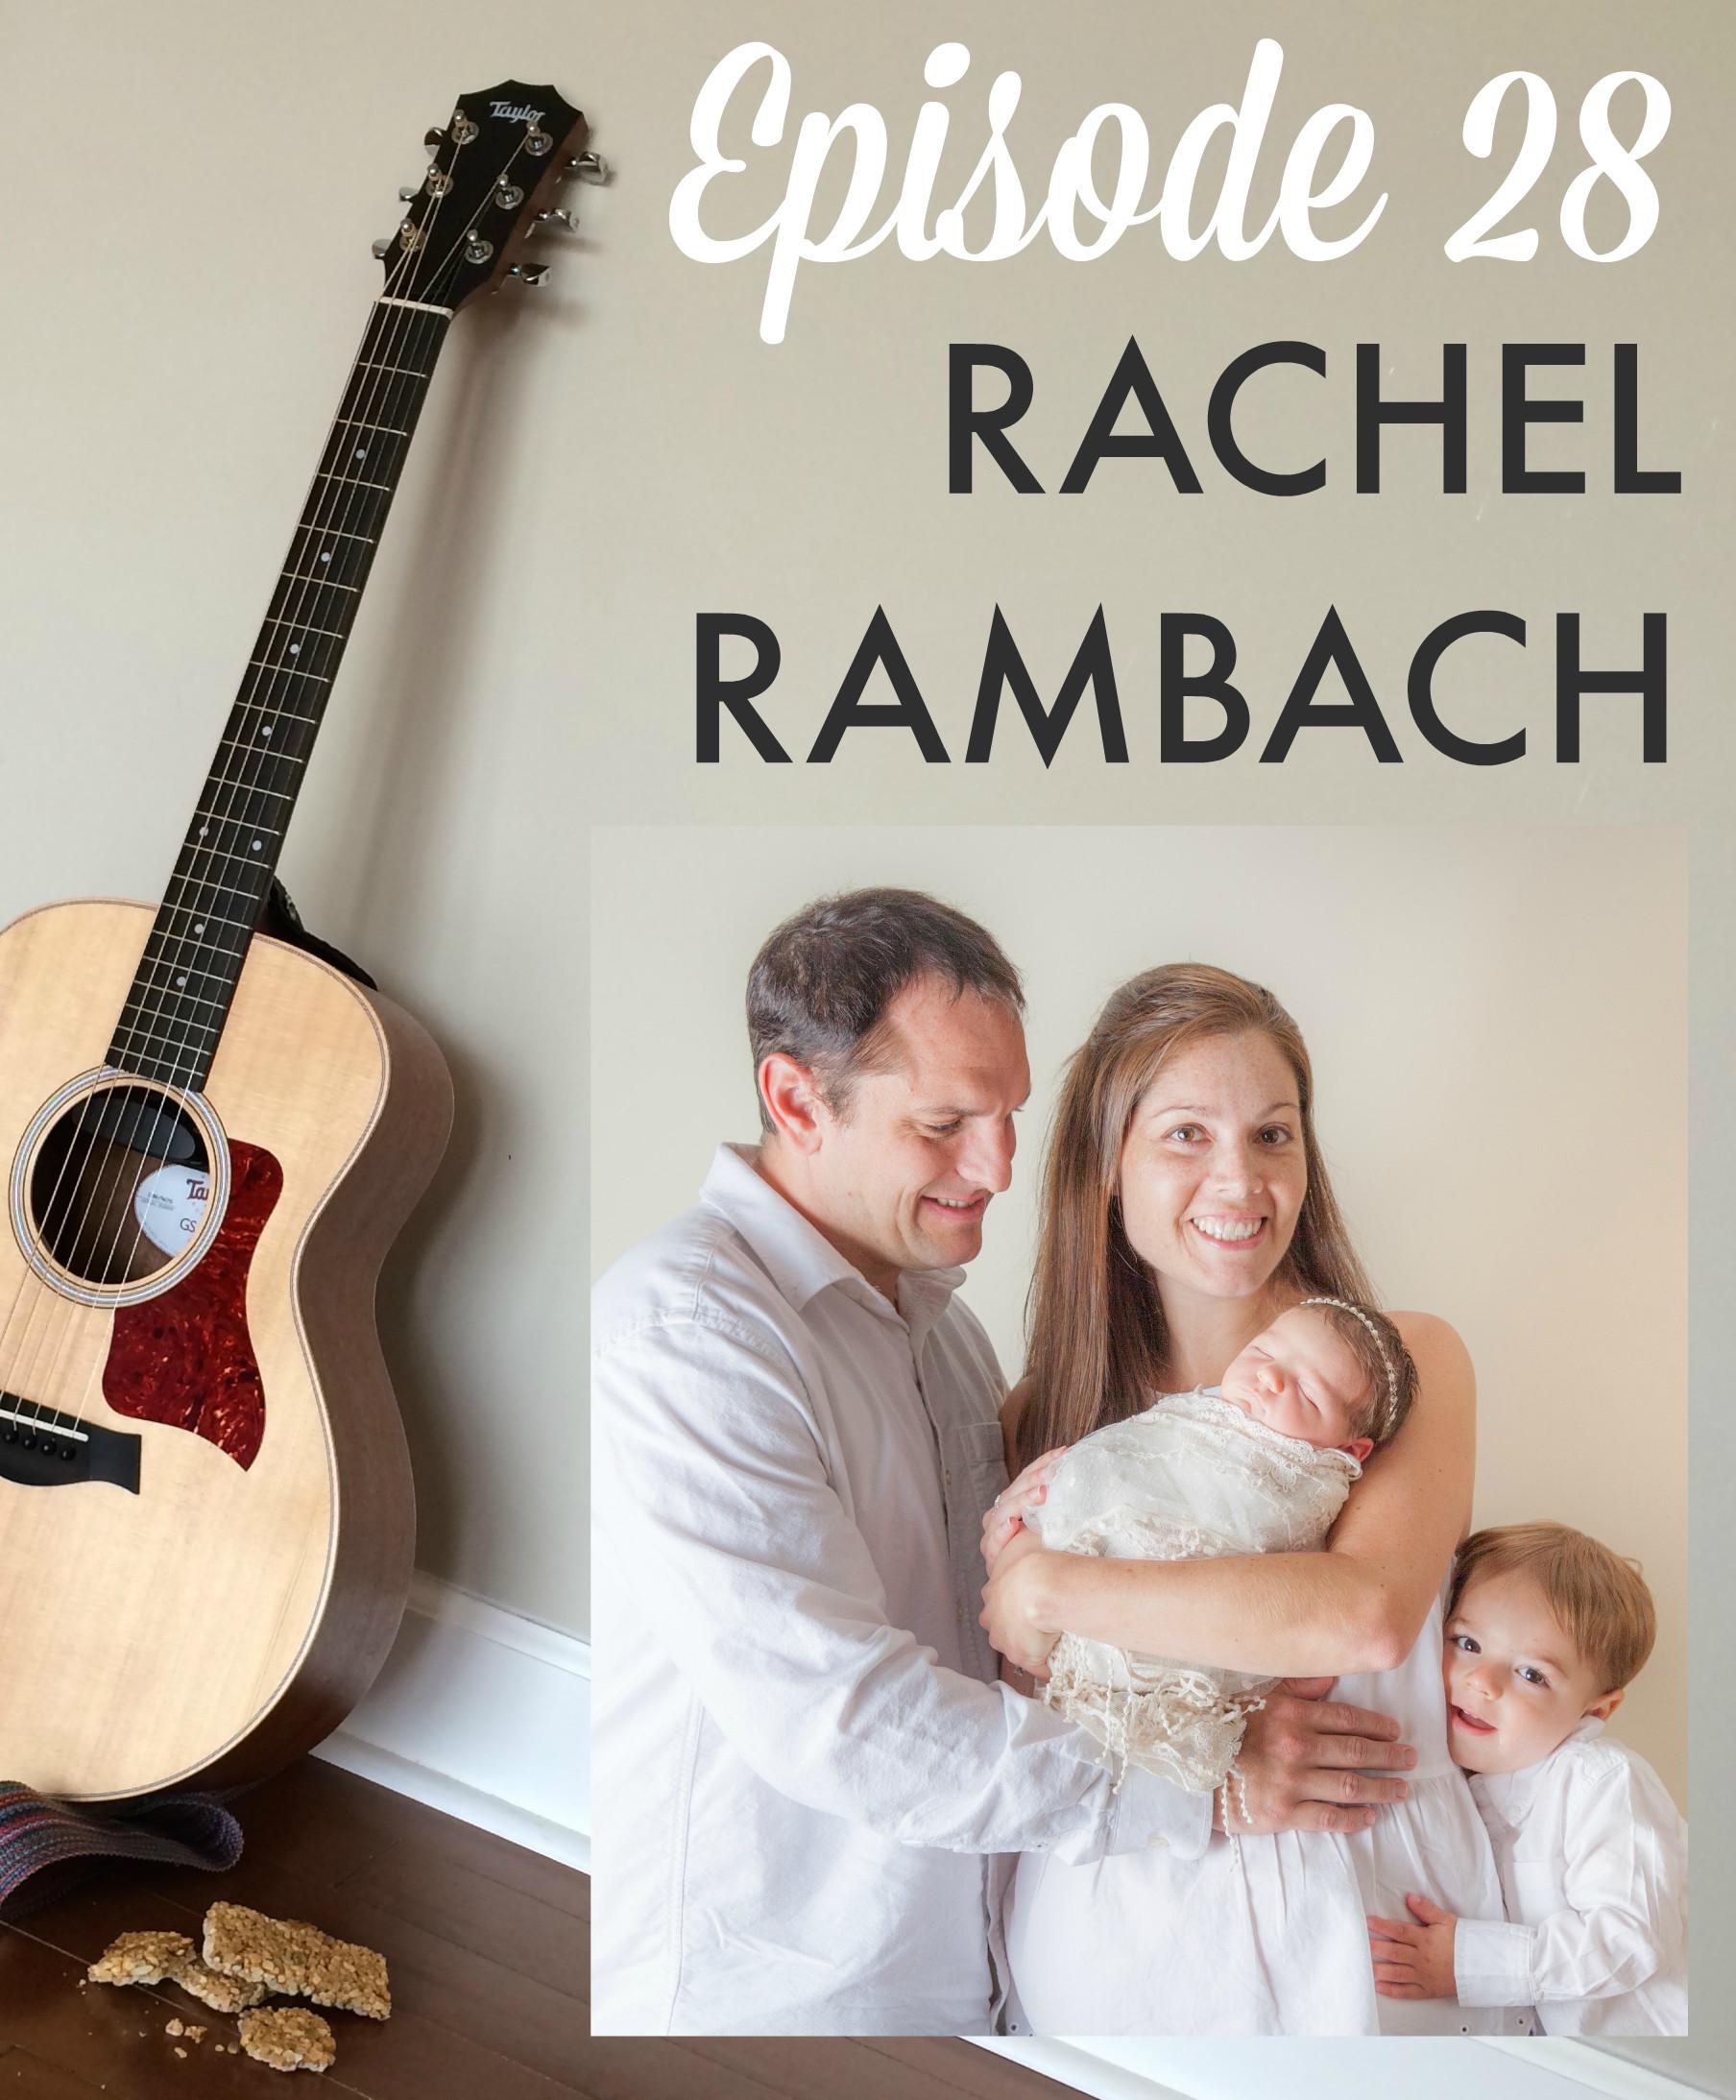 GGB Episode 28: Rachel Rambach